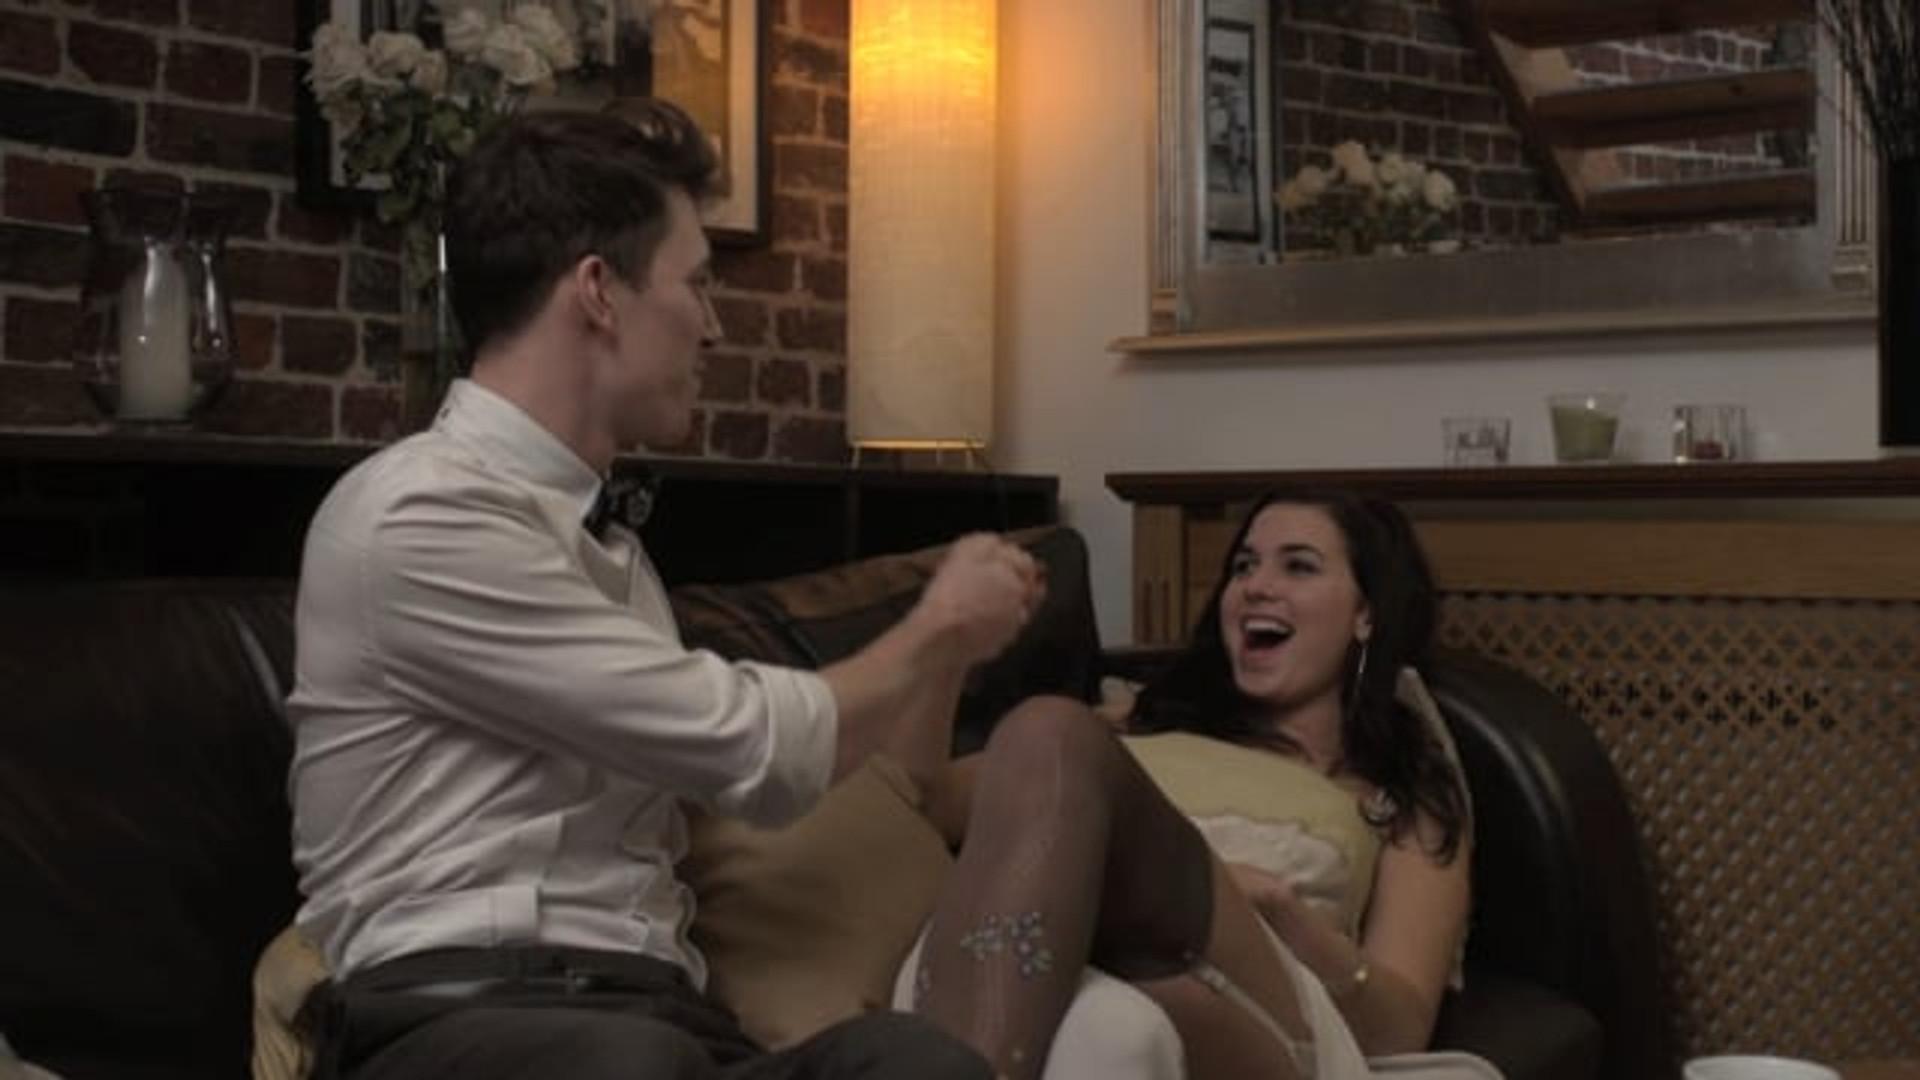 Love - Music Video